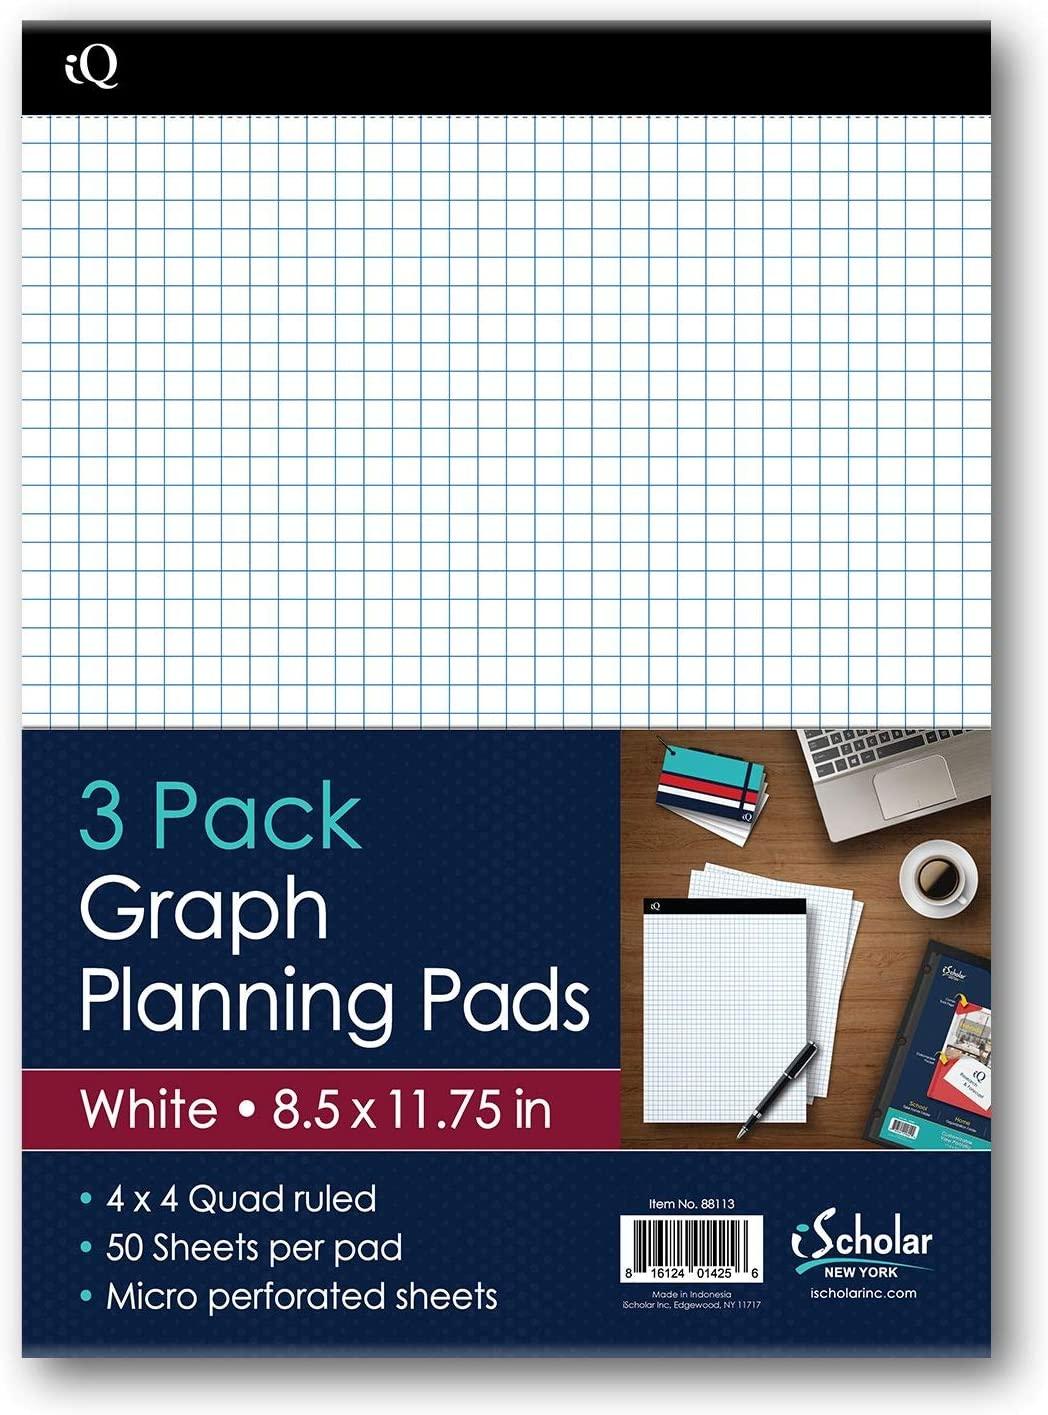 iScholar iQ Graph Planning Pads, 4 x 4 Quad Ruled, 8.5